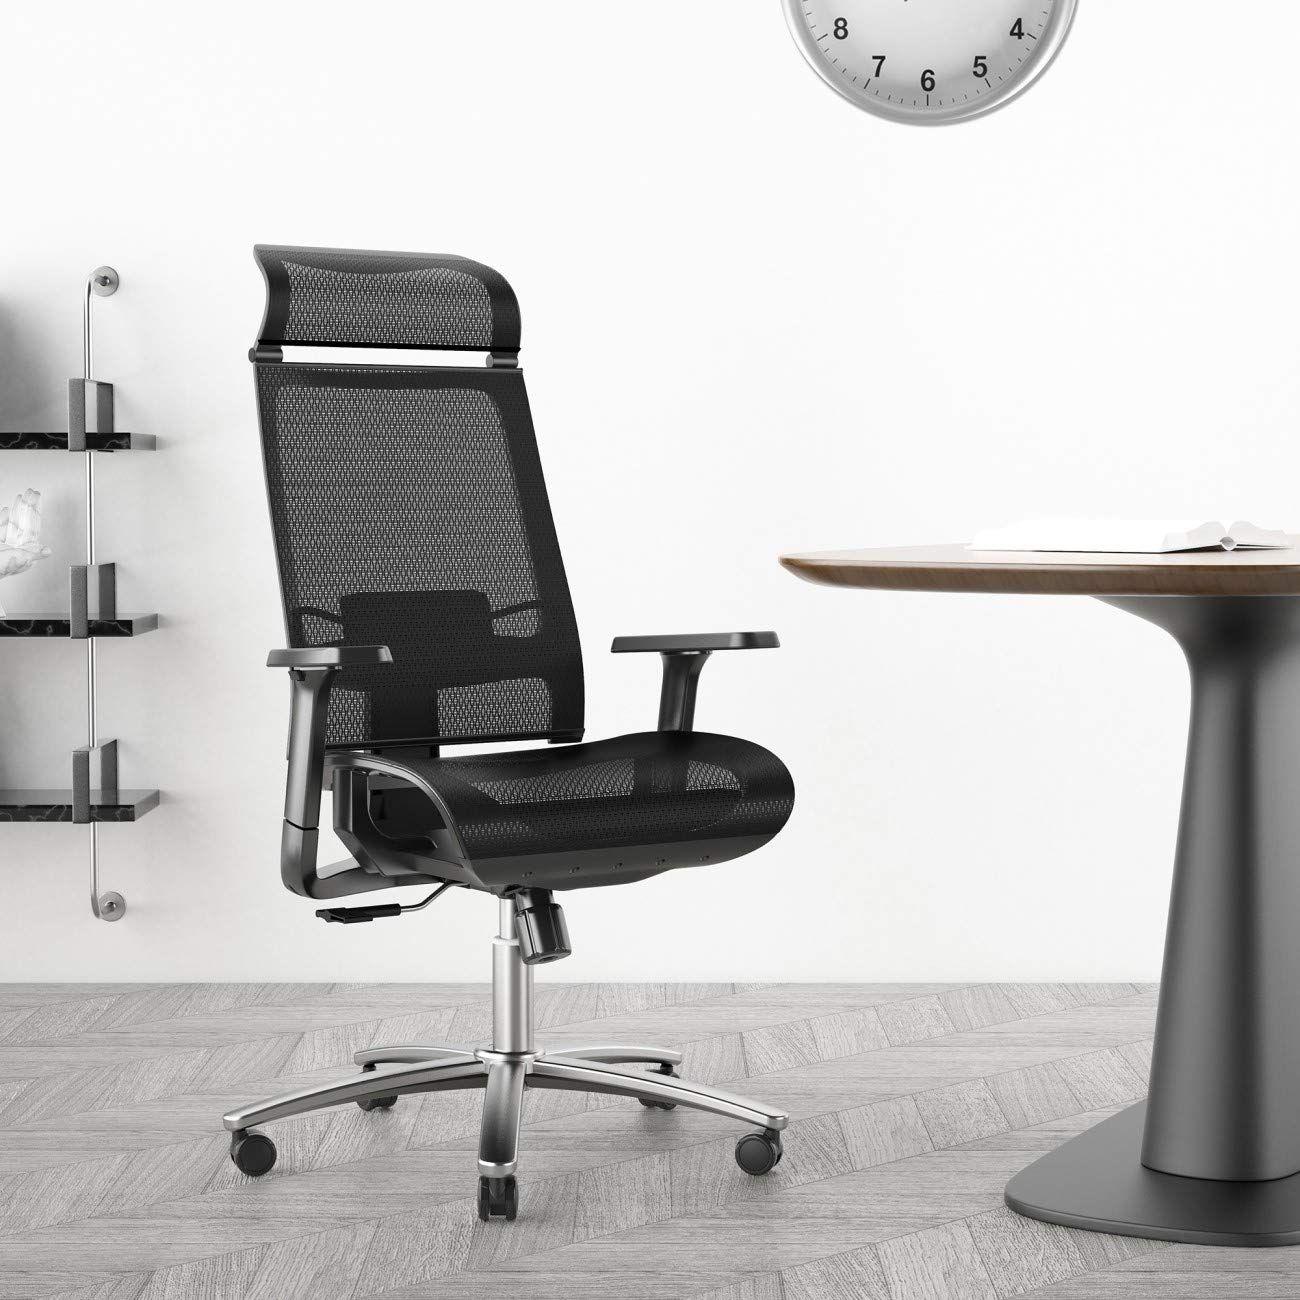 Bilkoh Ergonomic Computer Headrest Adjustable In 2020 Ergonomic Office Chair Mesh Office Chair Computer Desk Chair